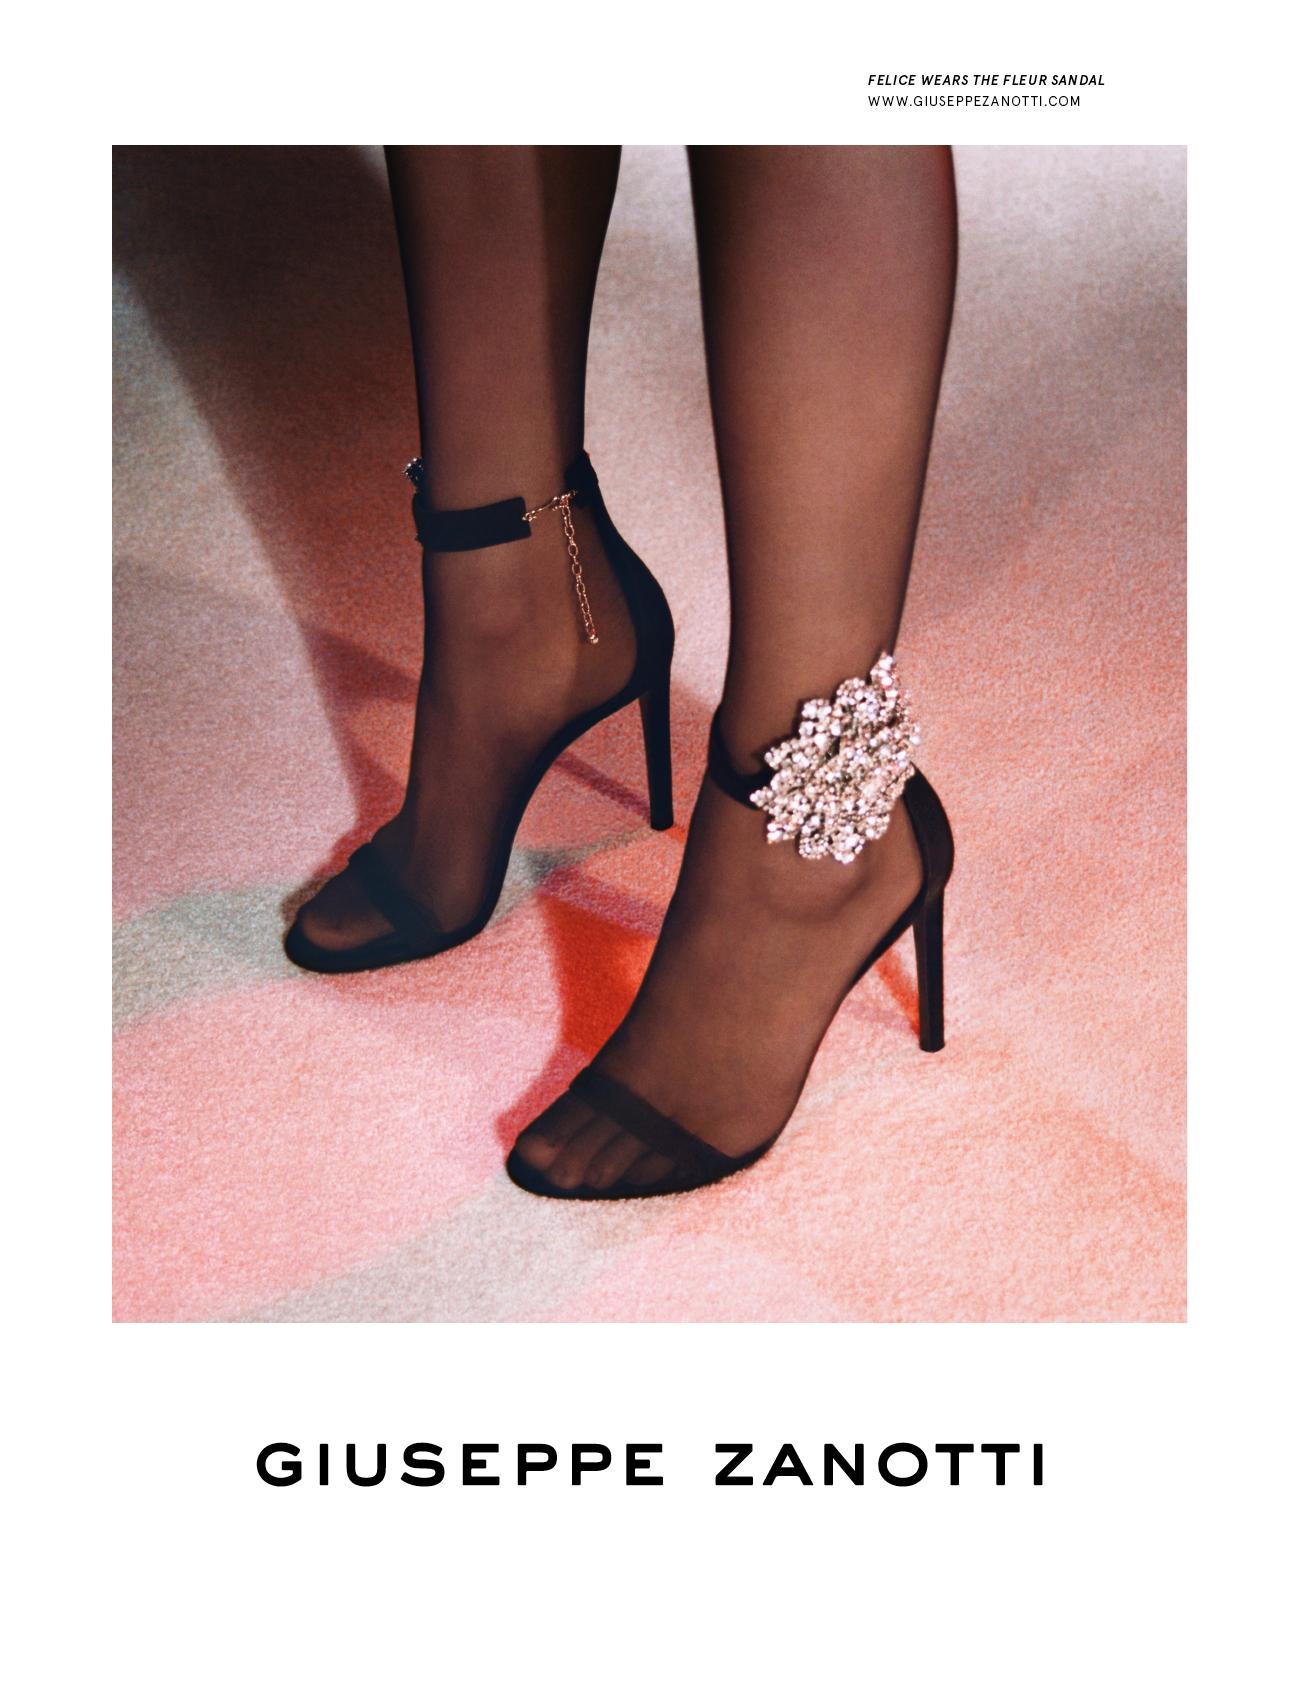 giuseppe_zanotti_fall_2019_campaign7.jpg